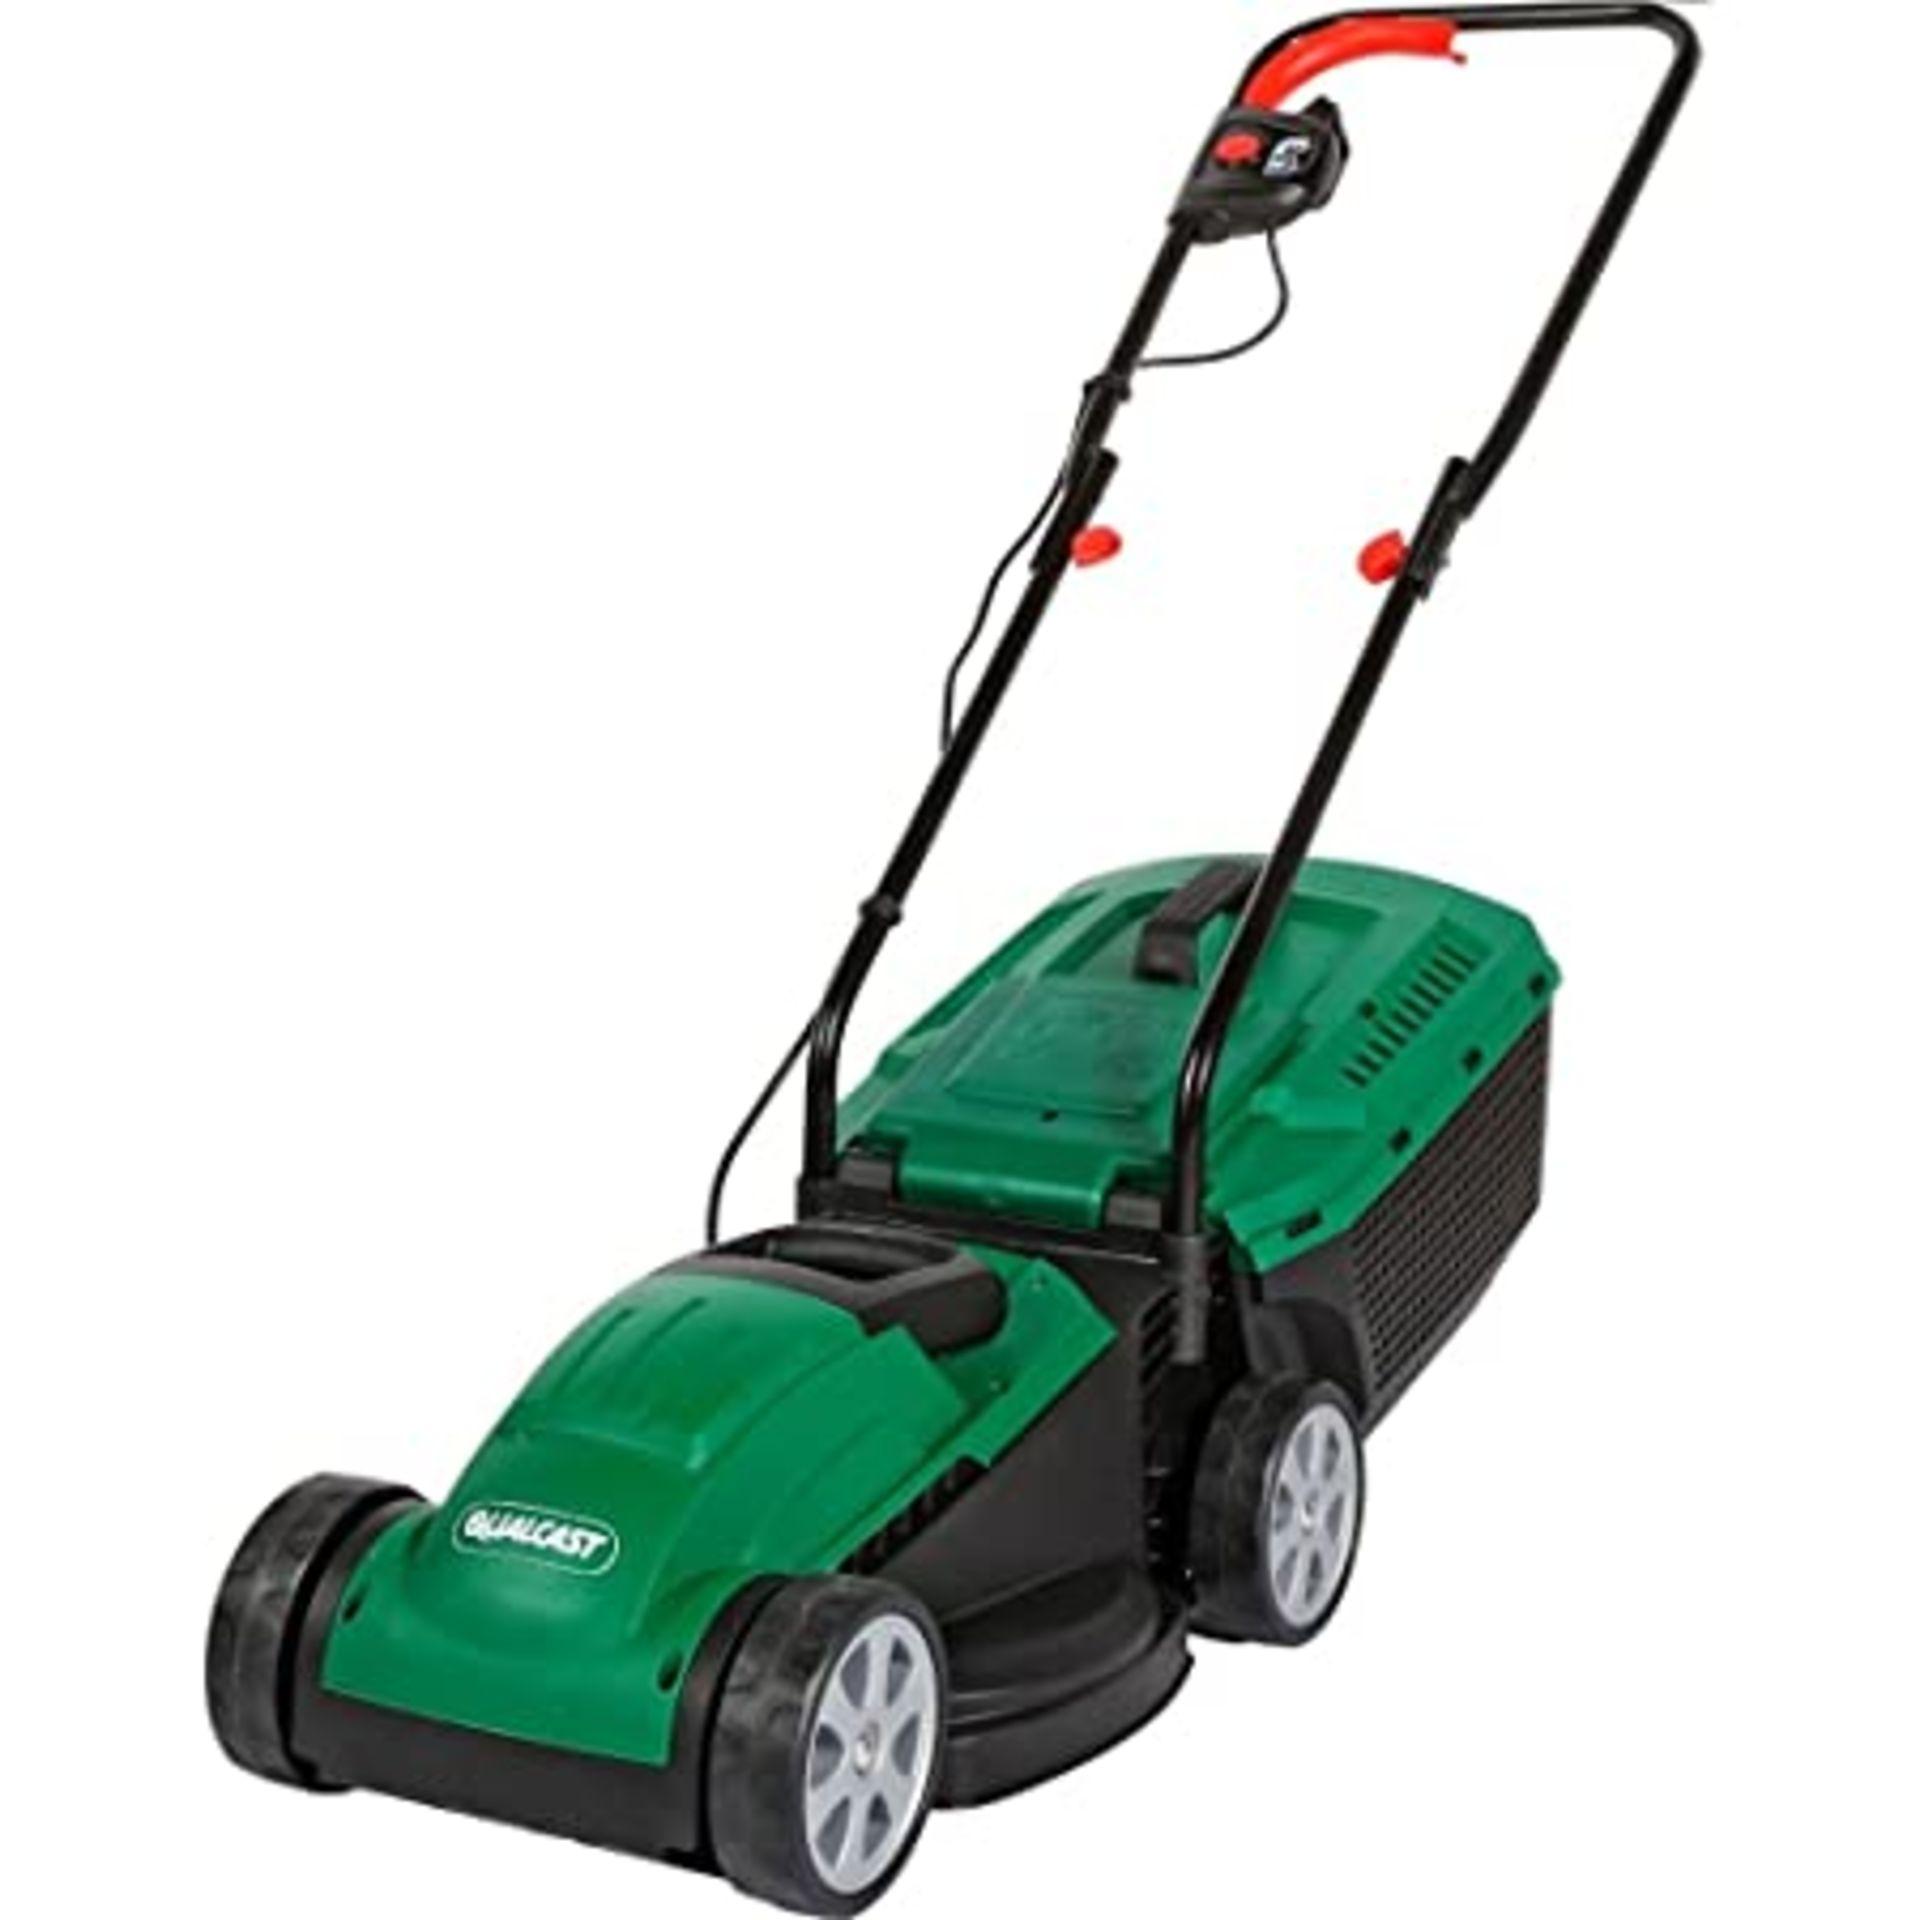 (P9) 2x Items. 1x Powerbase 32cm 400W Electric Cylinder Lawn Mower. RRP £89. 1x Qualcast 32cm 1200 - Image 2 of 3